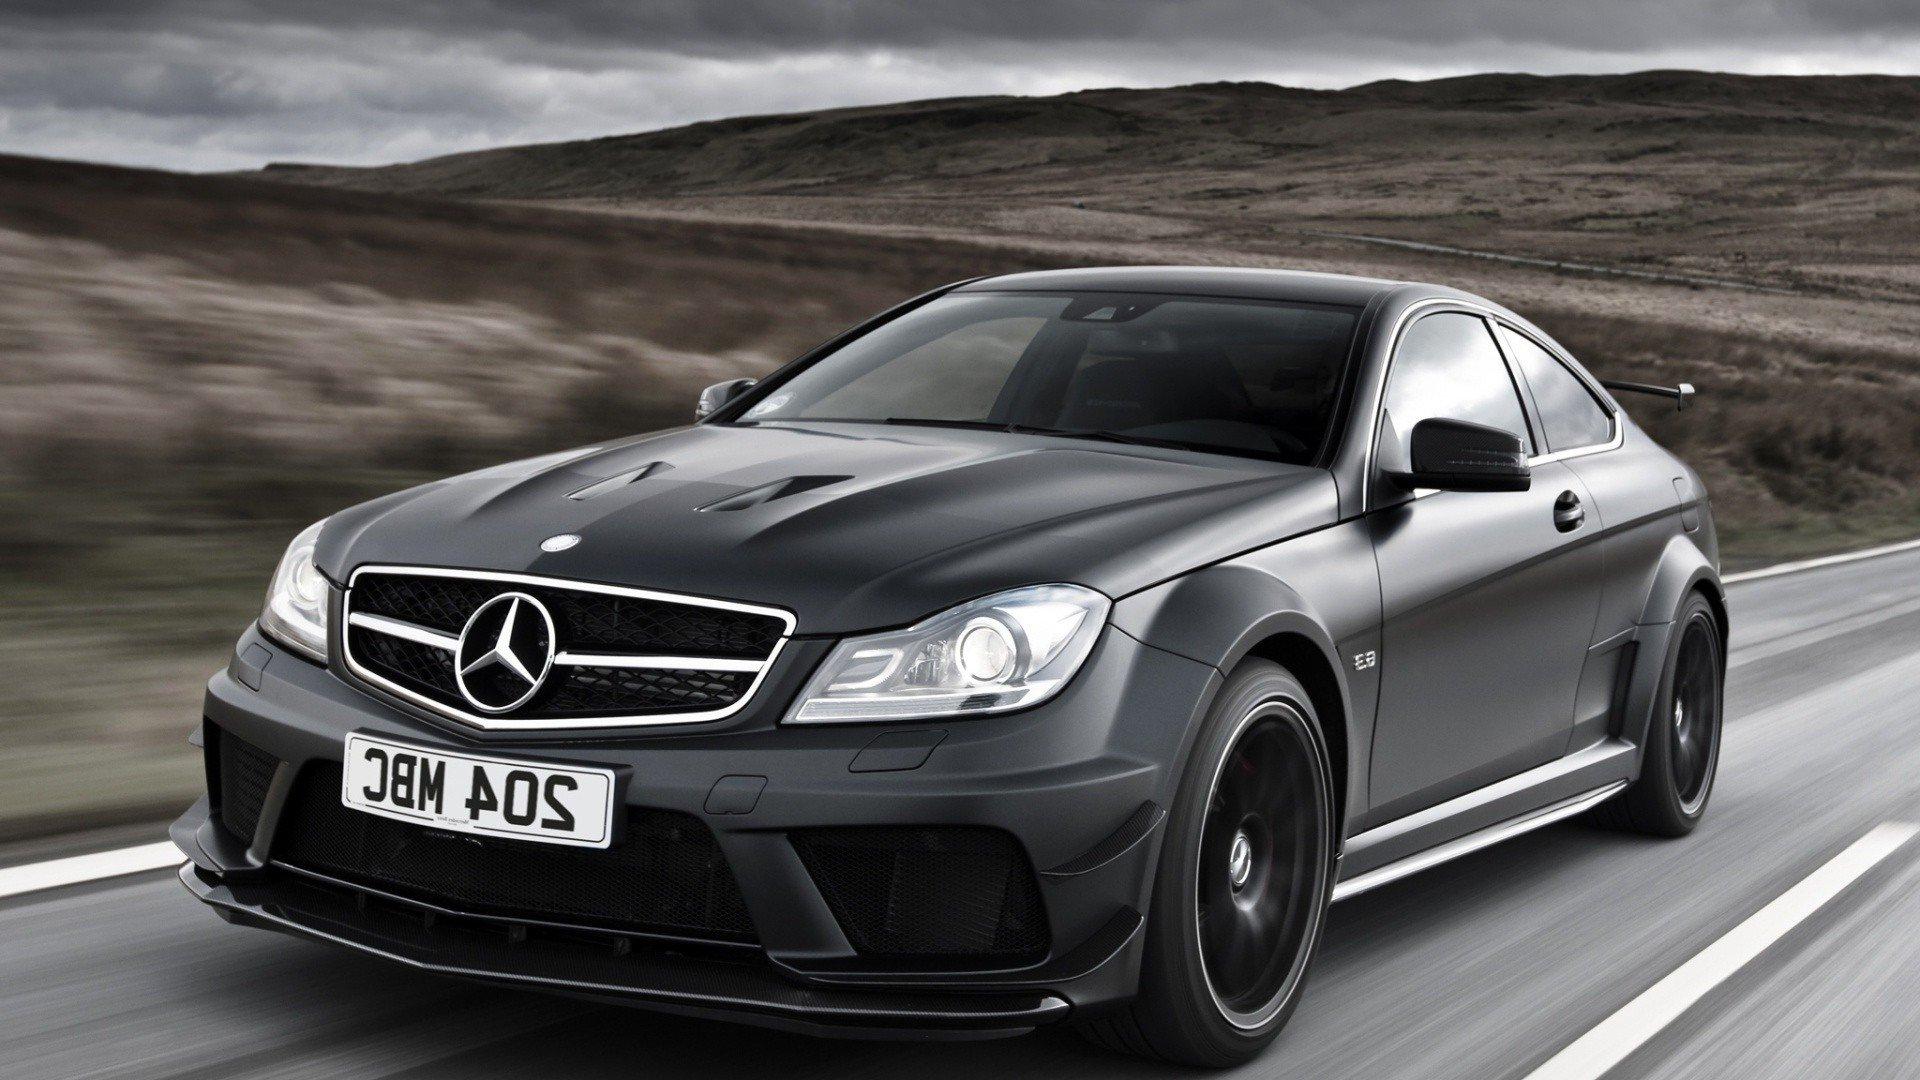 Mercedes Benz G3 Matte, HD Cars, 4k Wallpapers, Images ...